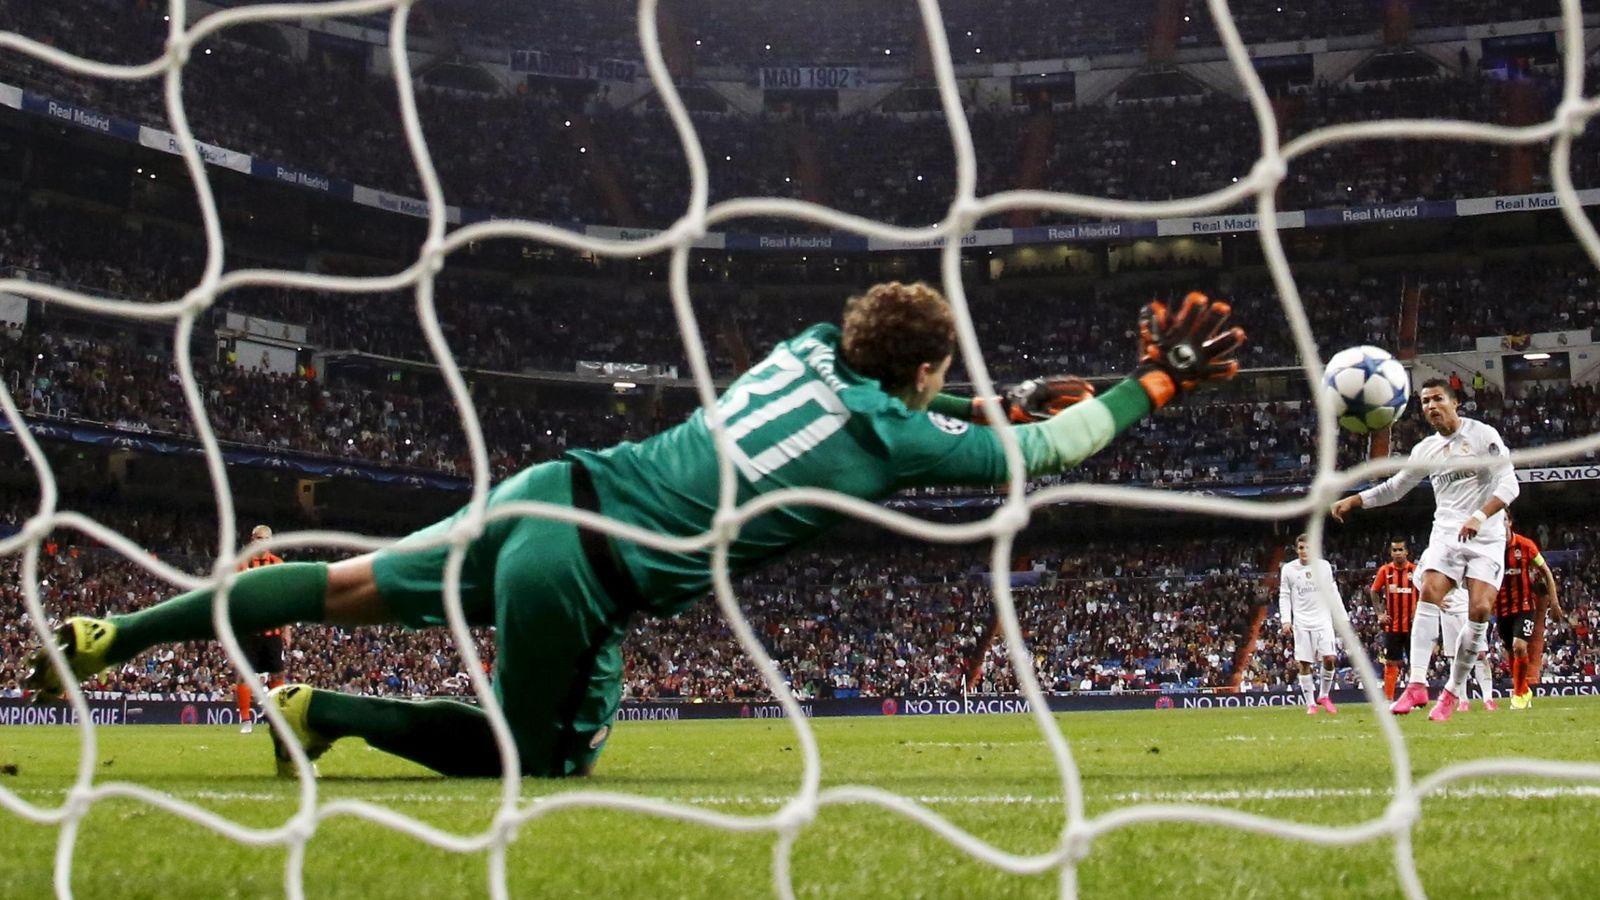 Foto: Cristiano Ronaldo tira a puerta durante un partido de la Champions. (Reuters)